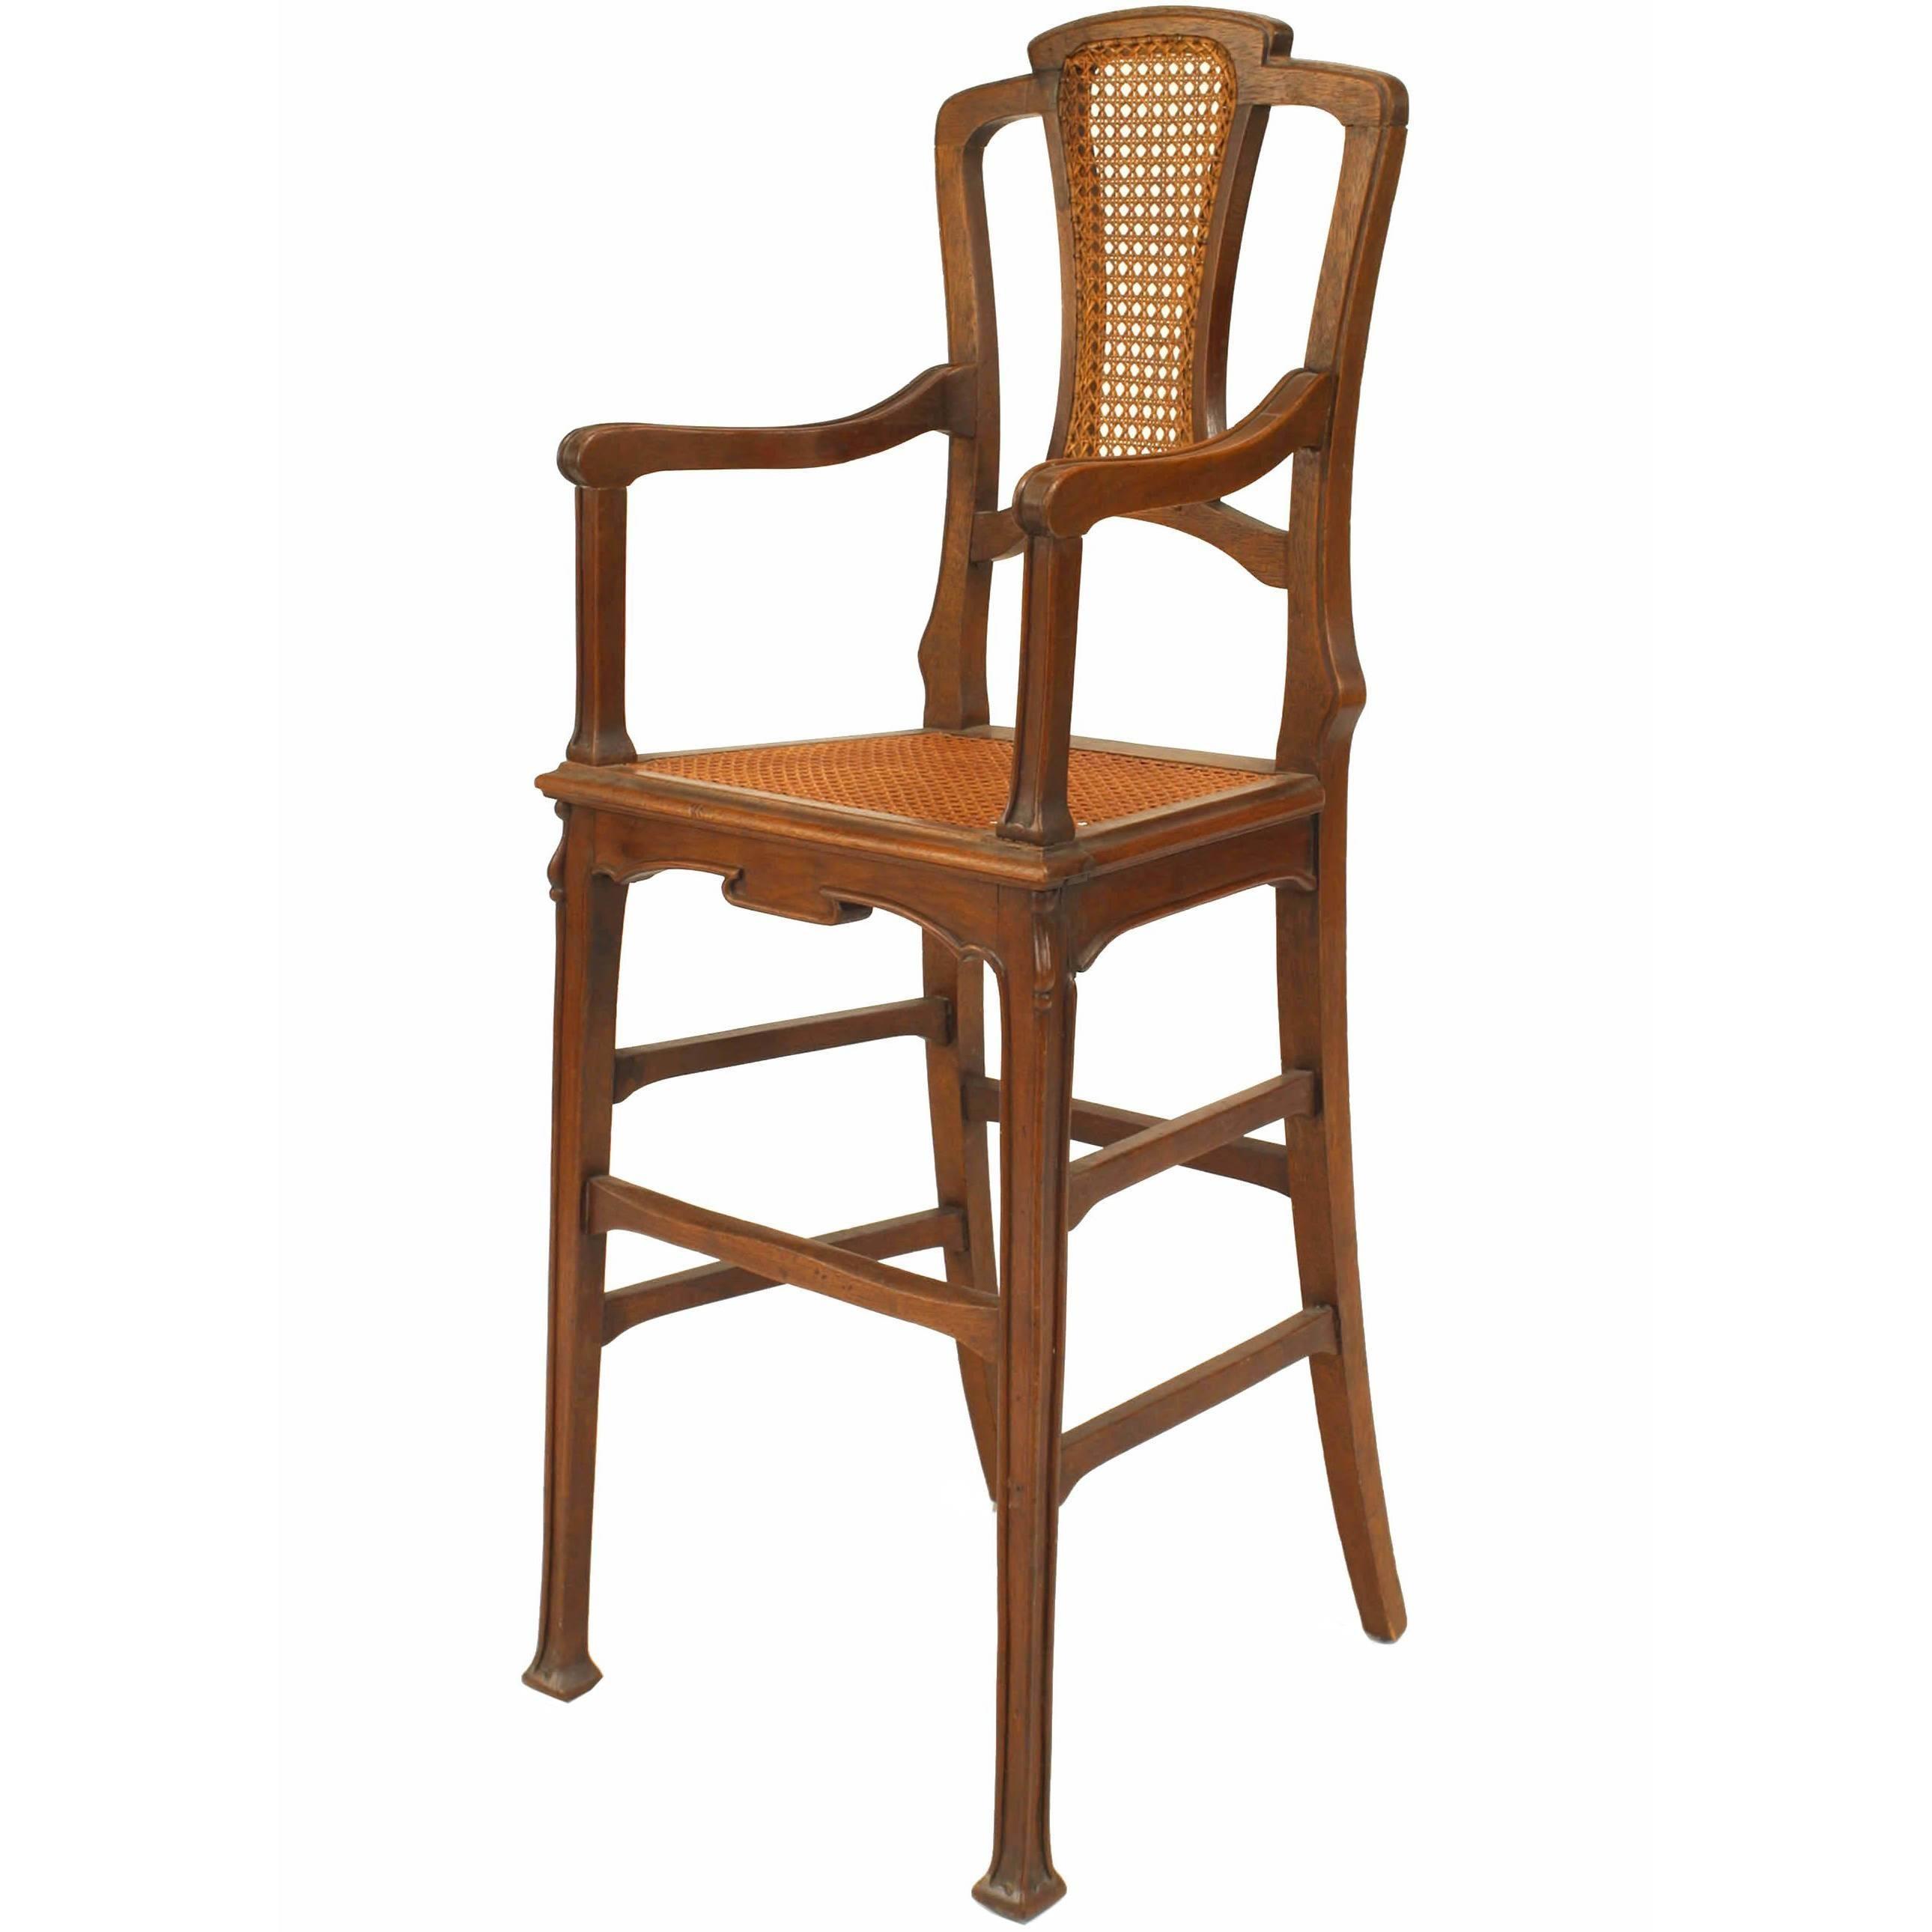 French Art Nouveau High Chair